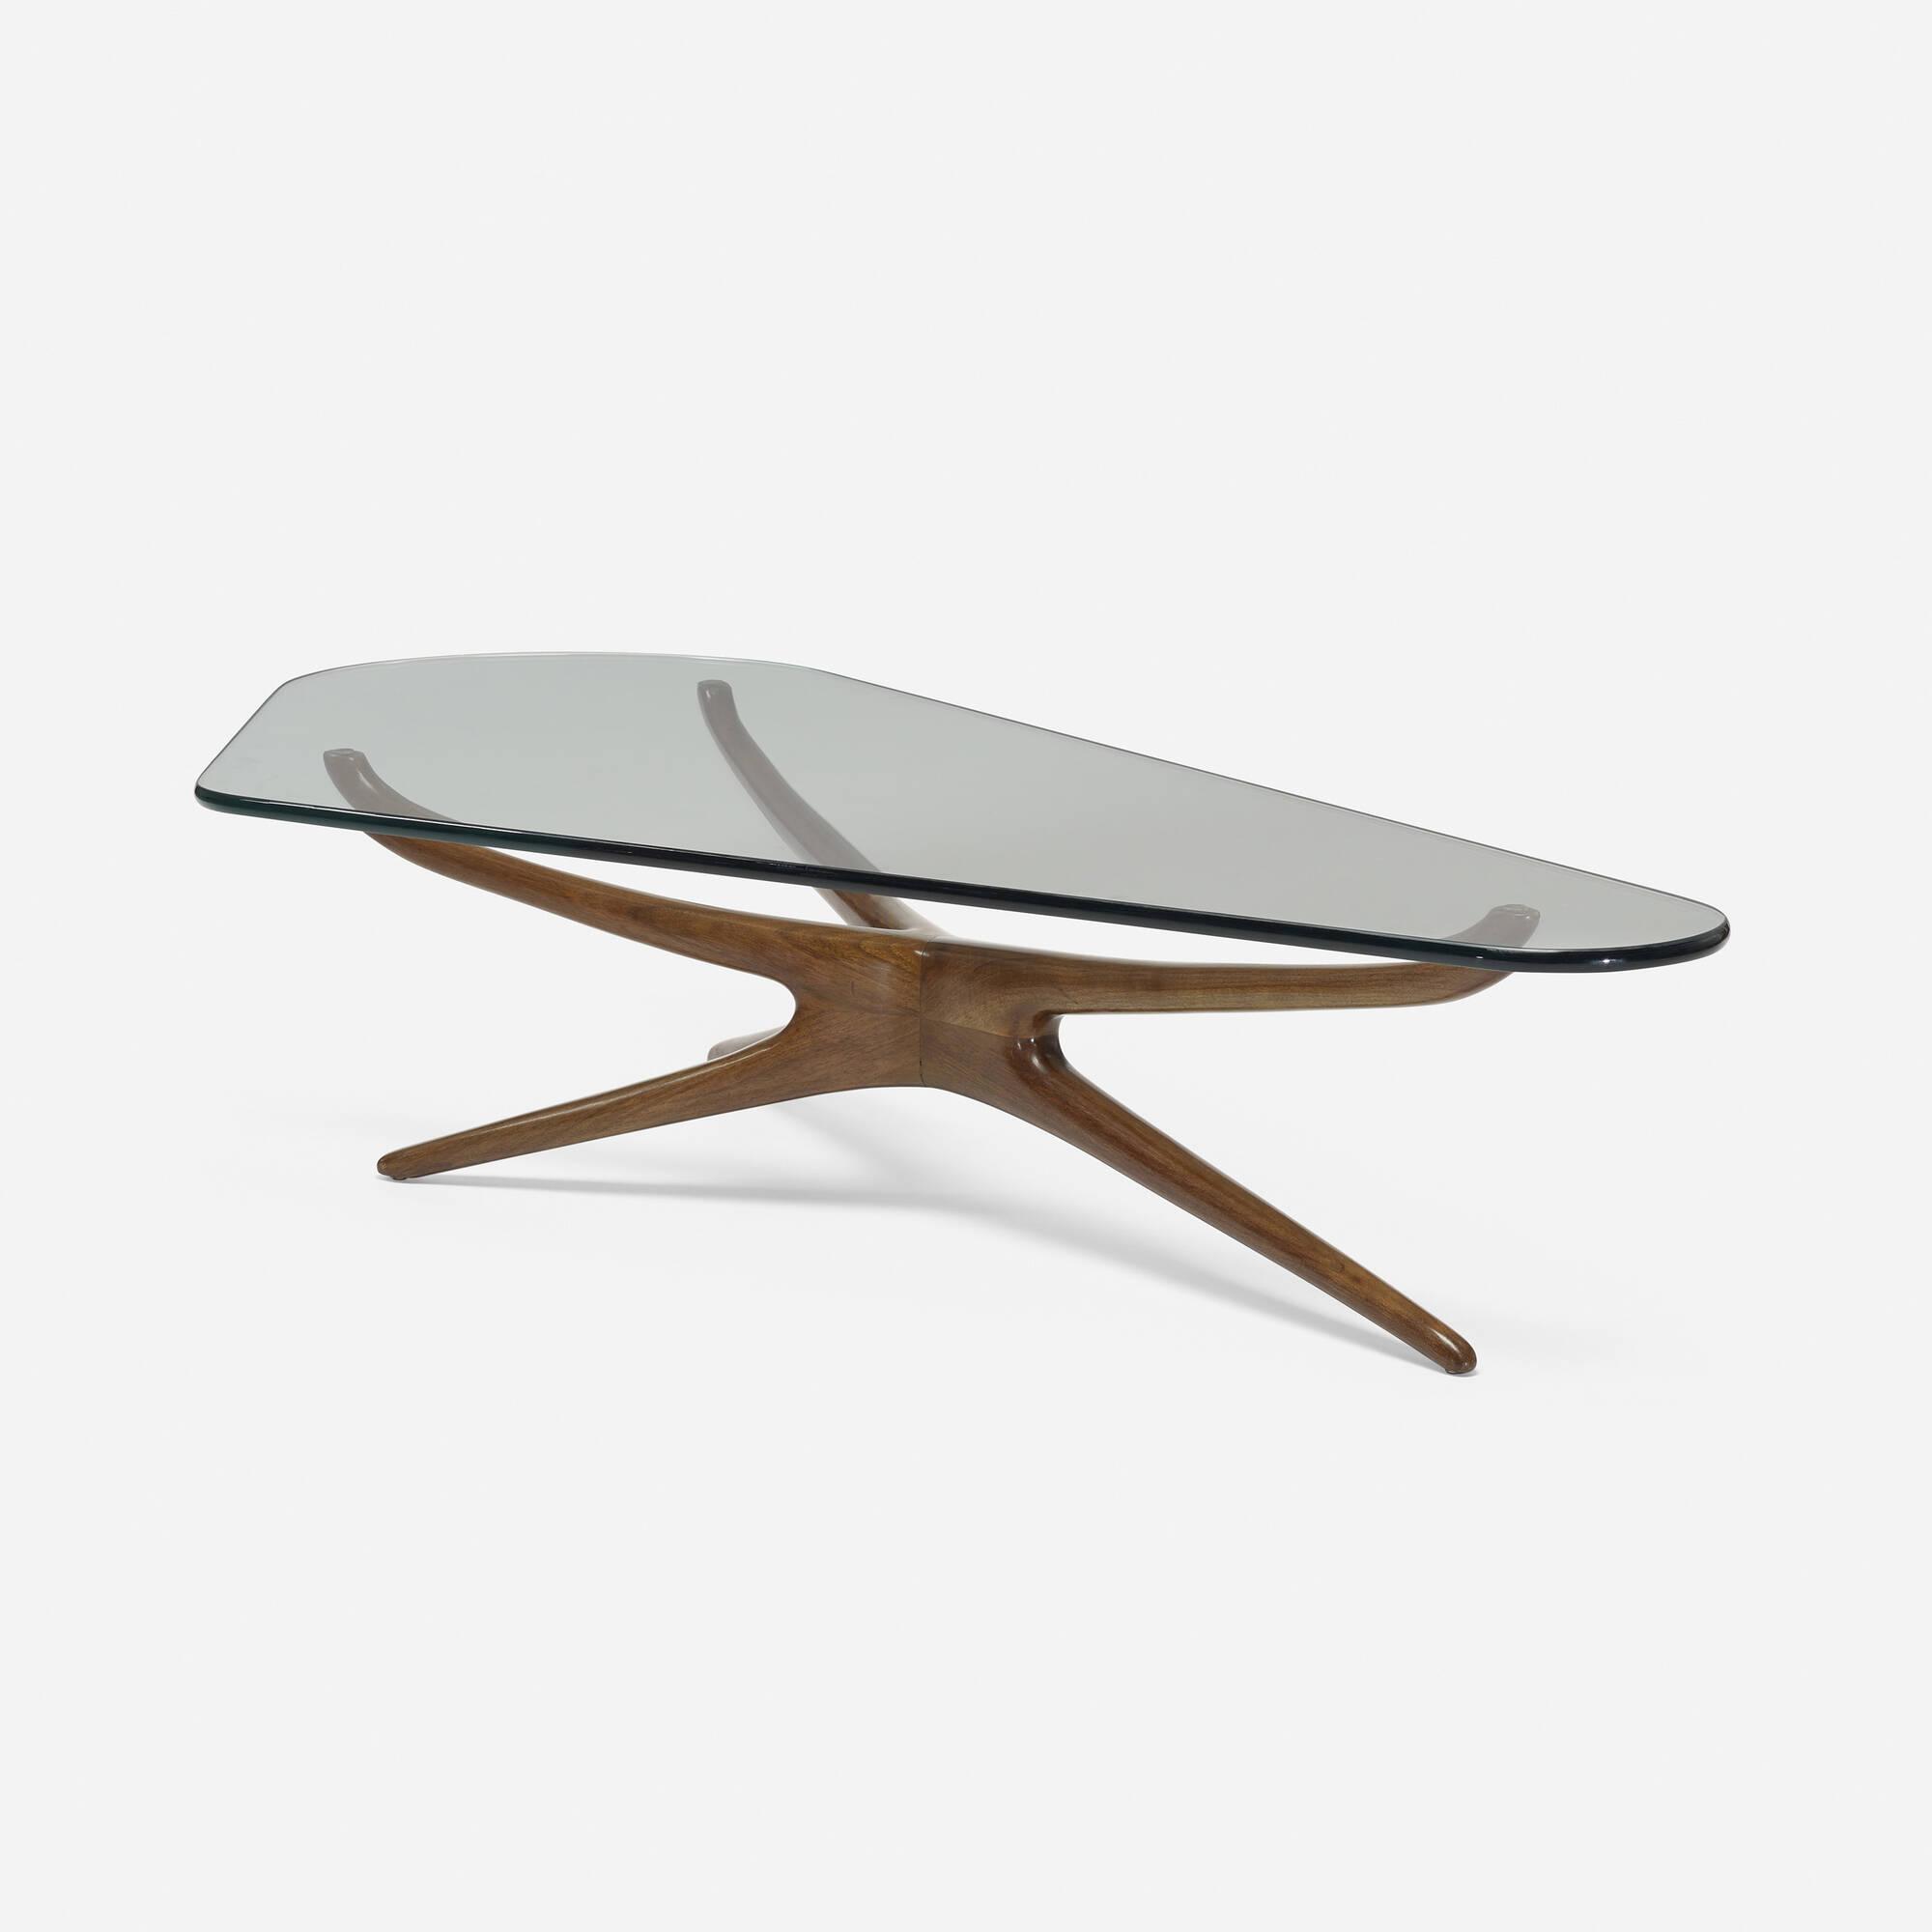 Kagan Coffee Table.327 Vladimir Kagan Tri Symmetric Coffee Table Design 26 March